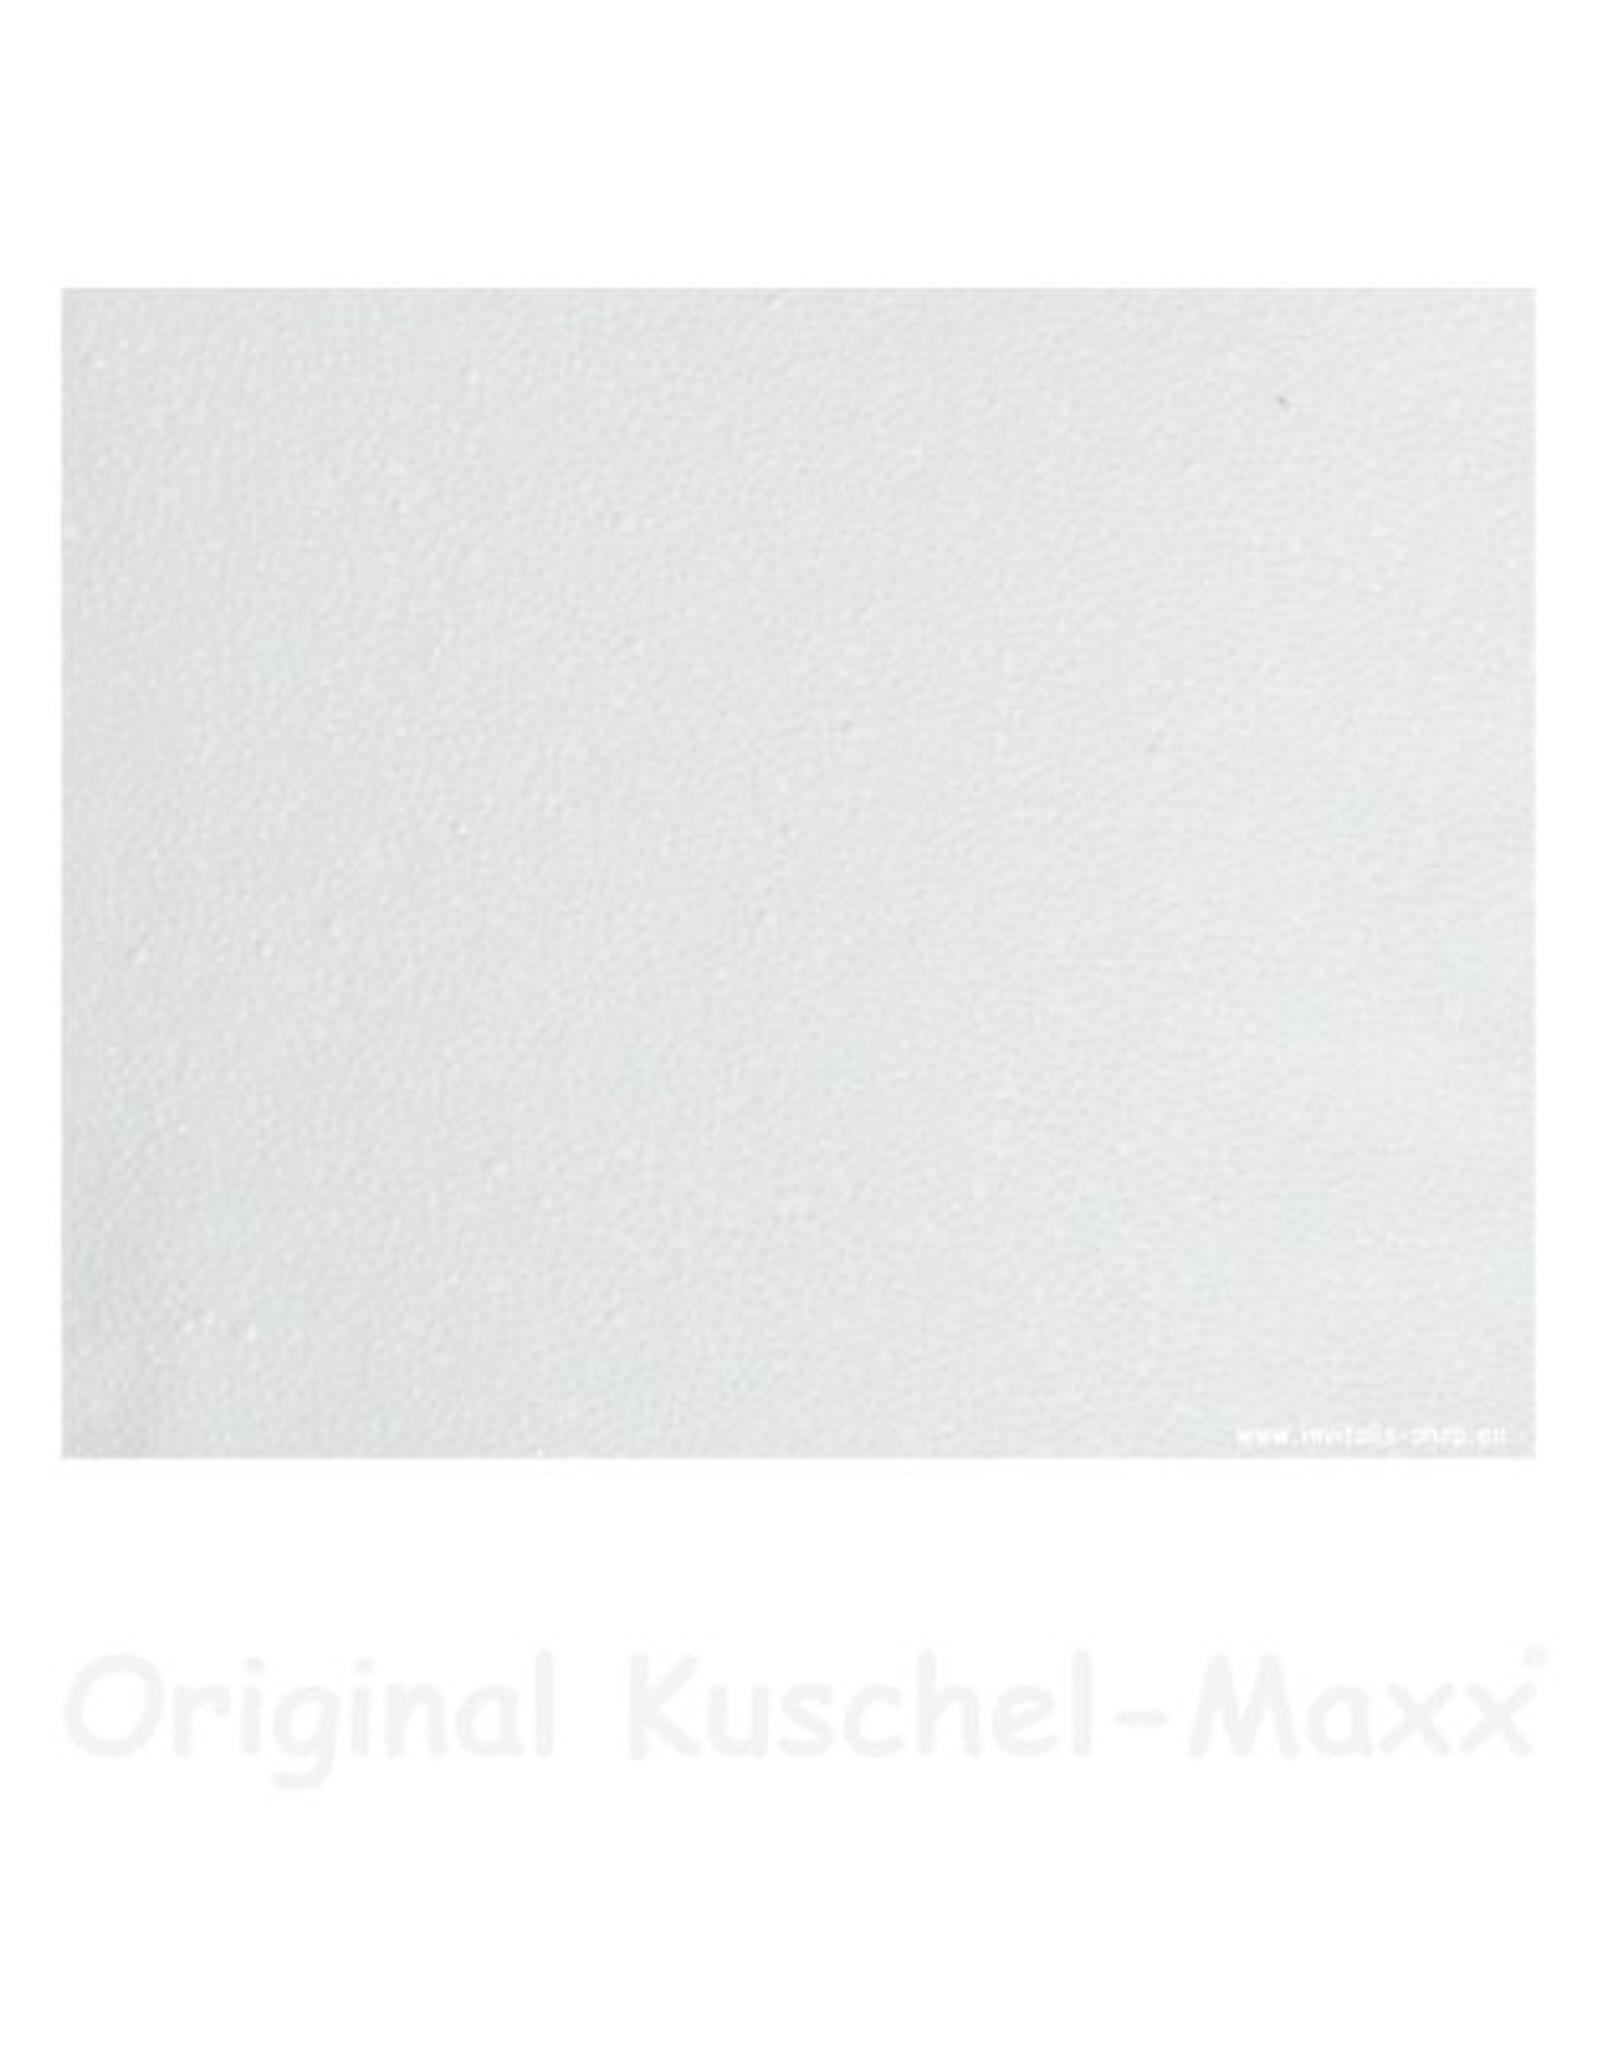 Kuschel-Maxx Kuschel-Maxx Refill